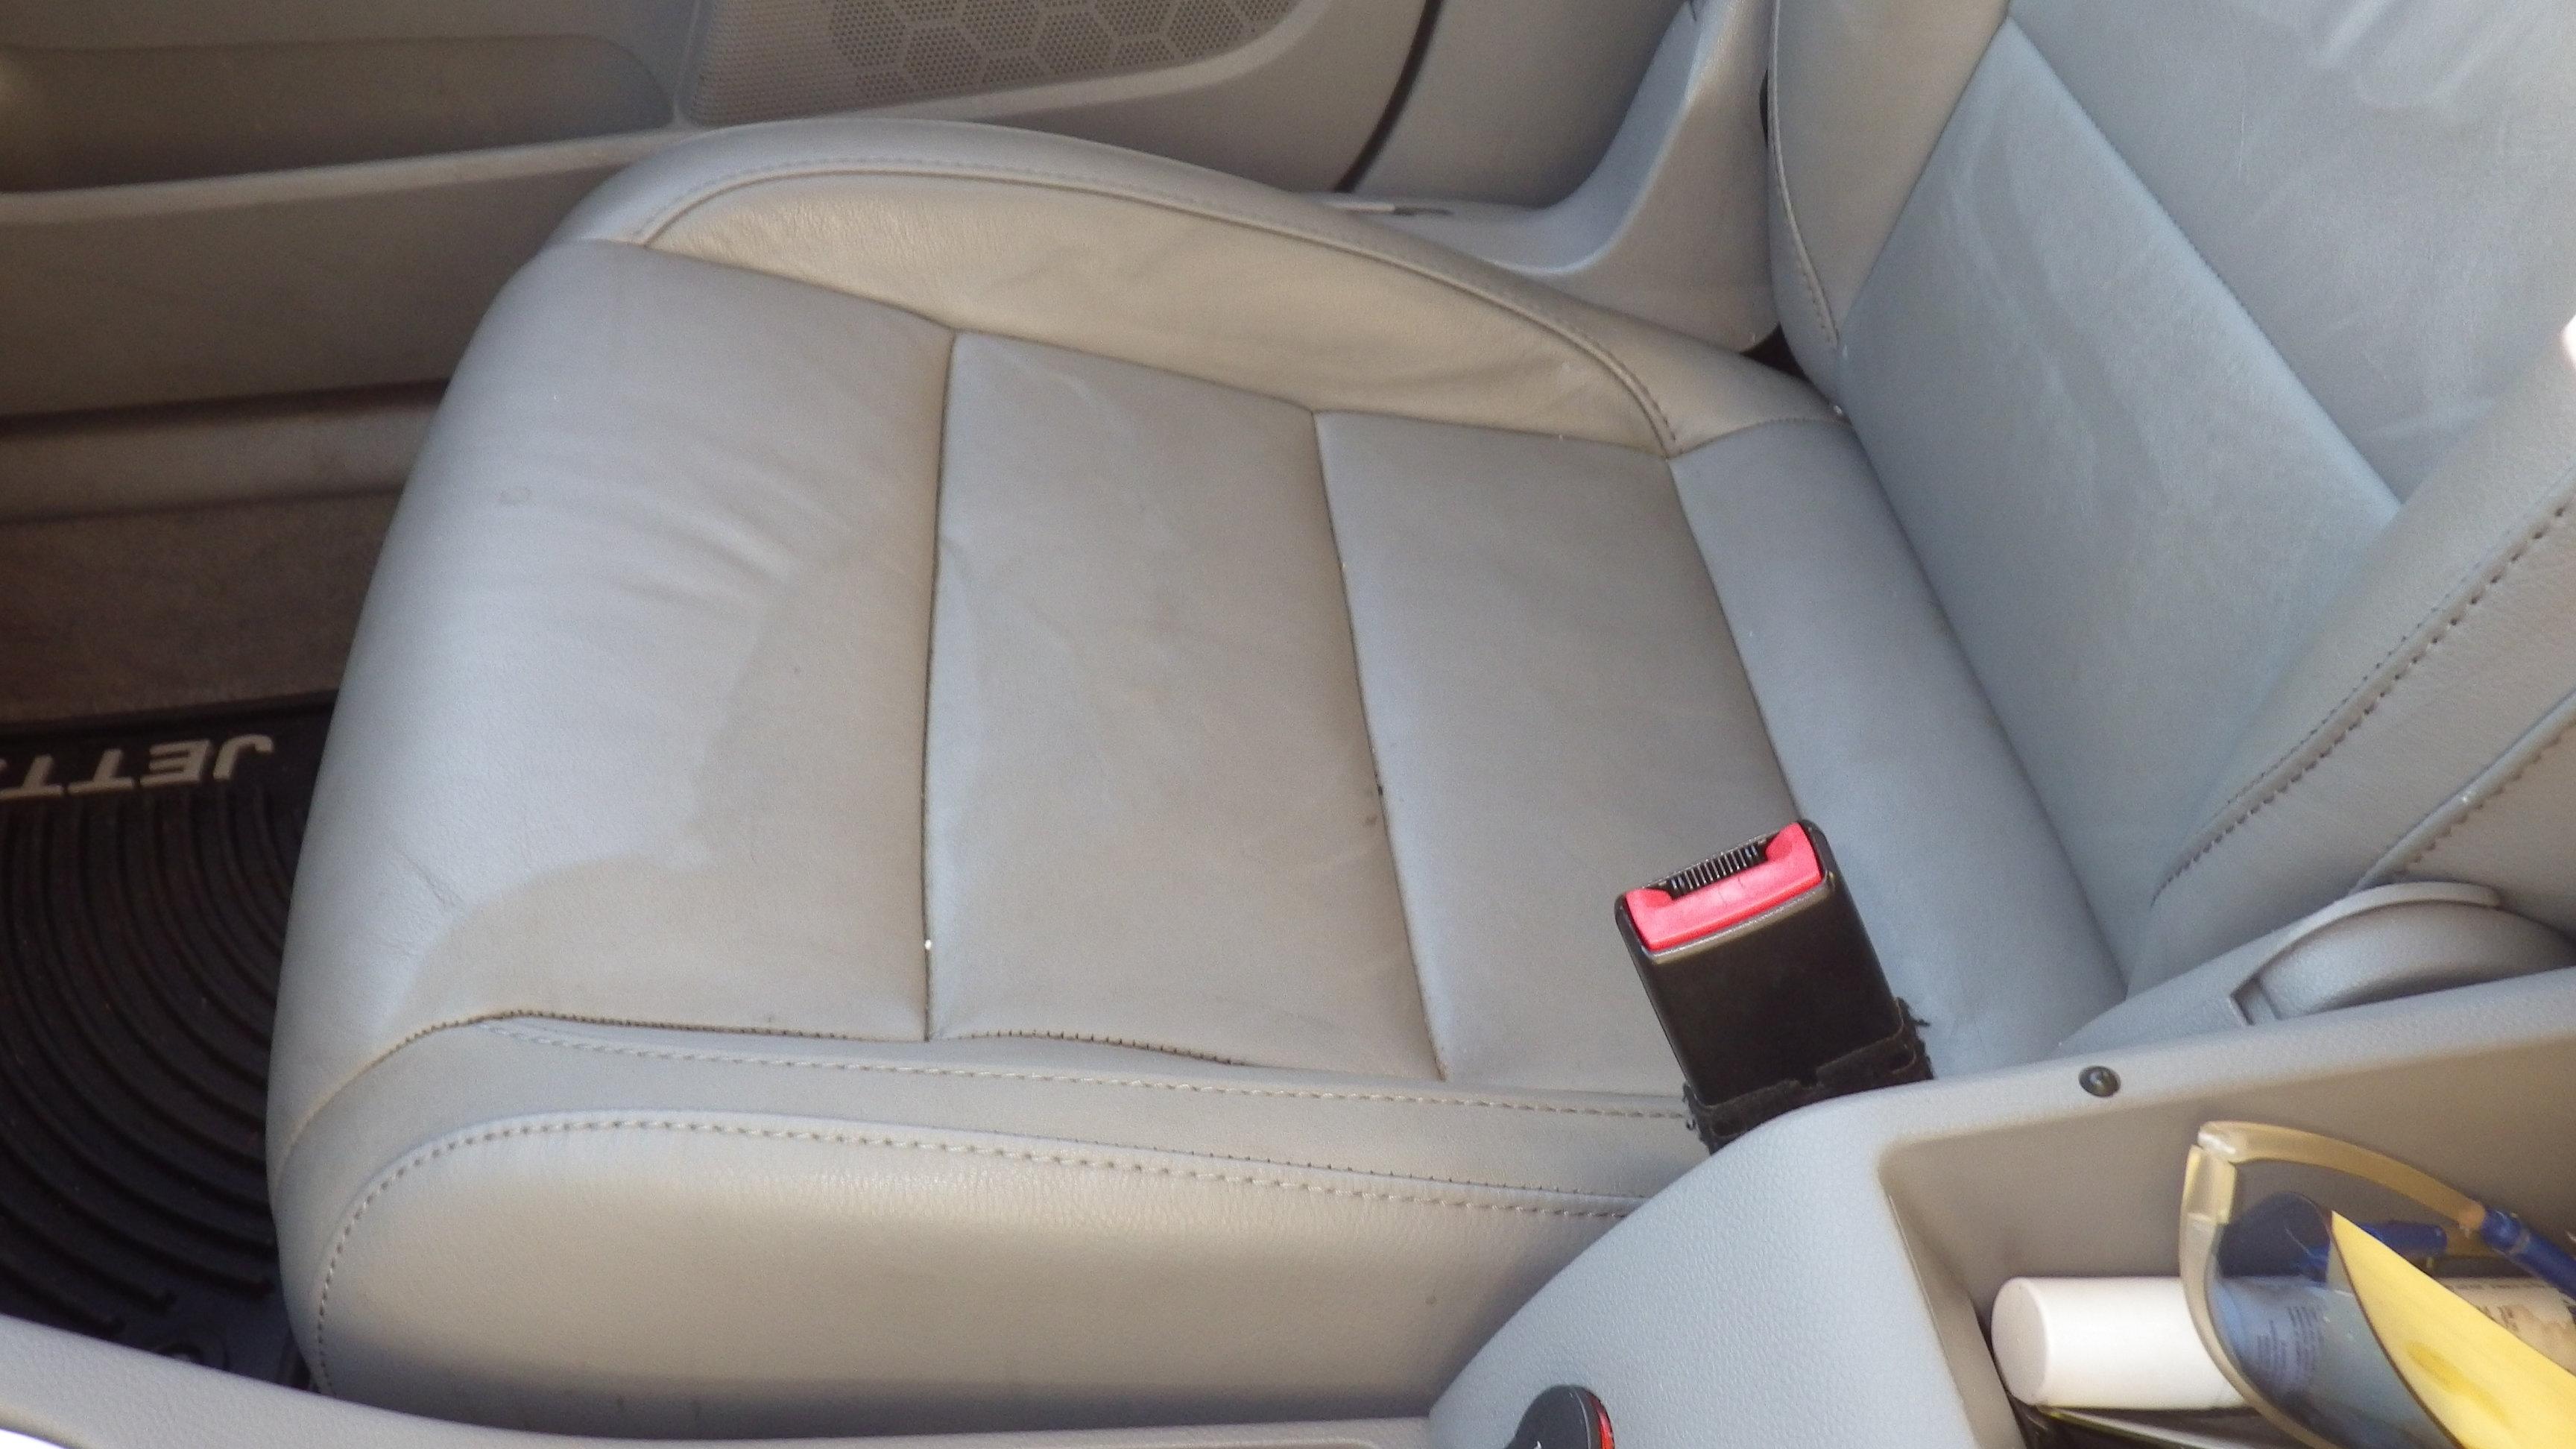 auto leather seat rain damage. Black Bedroom Furniture Sets. Home Design Ideas